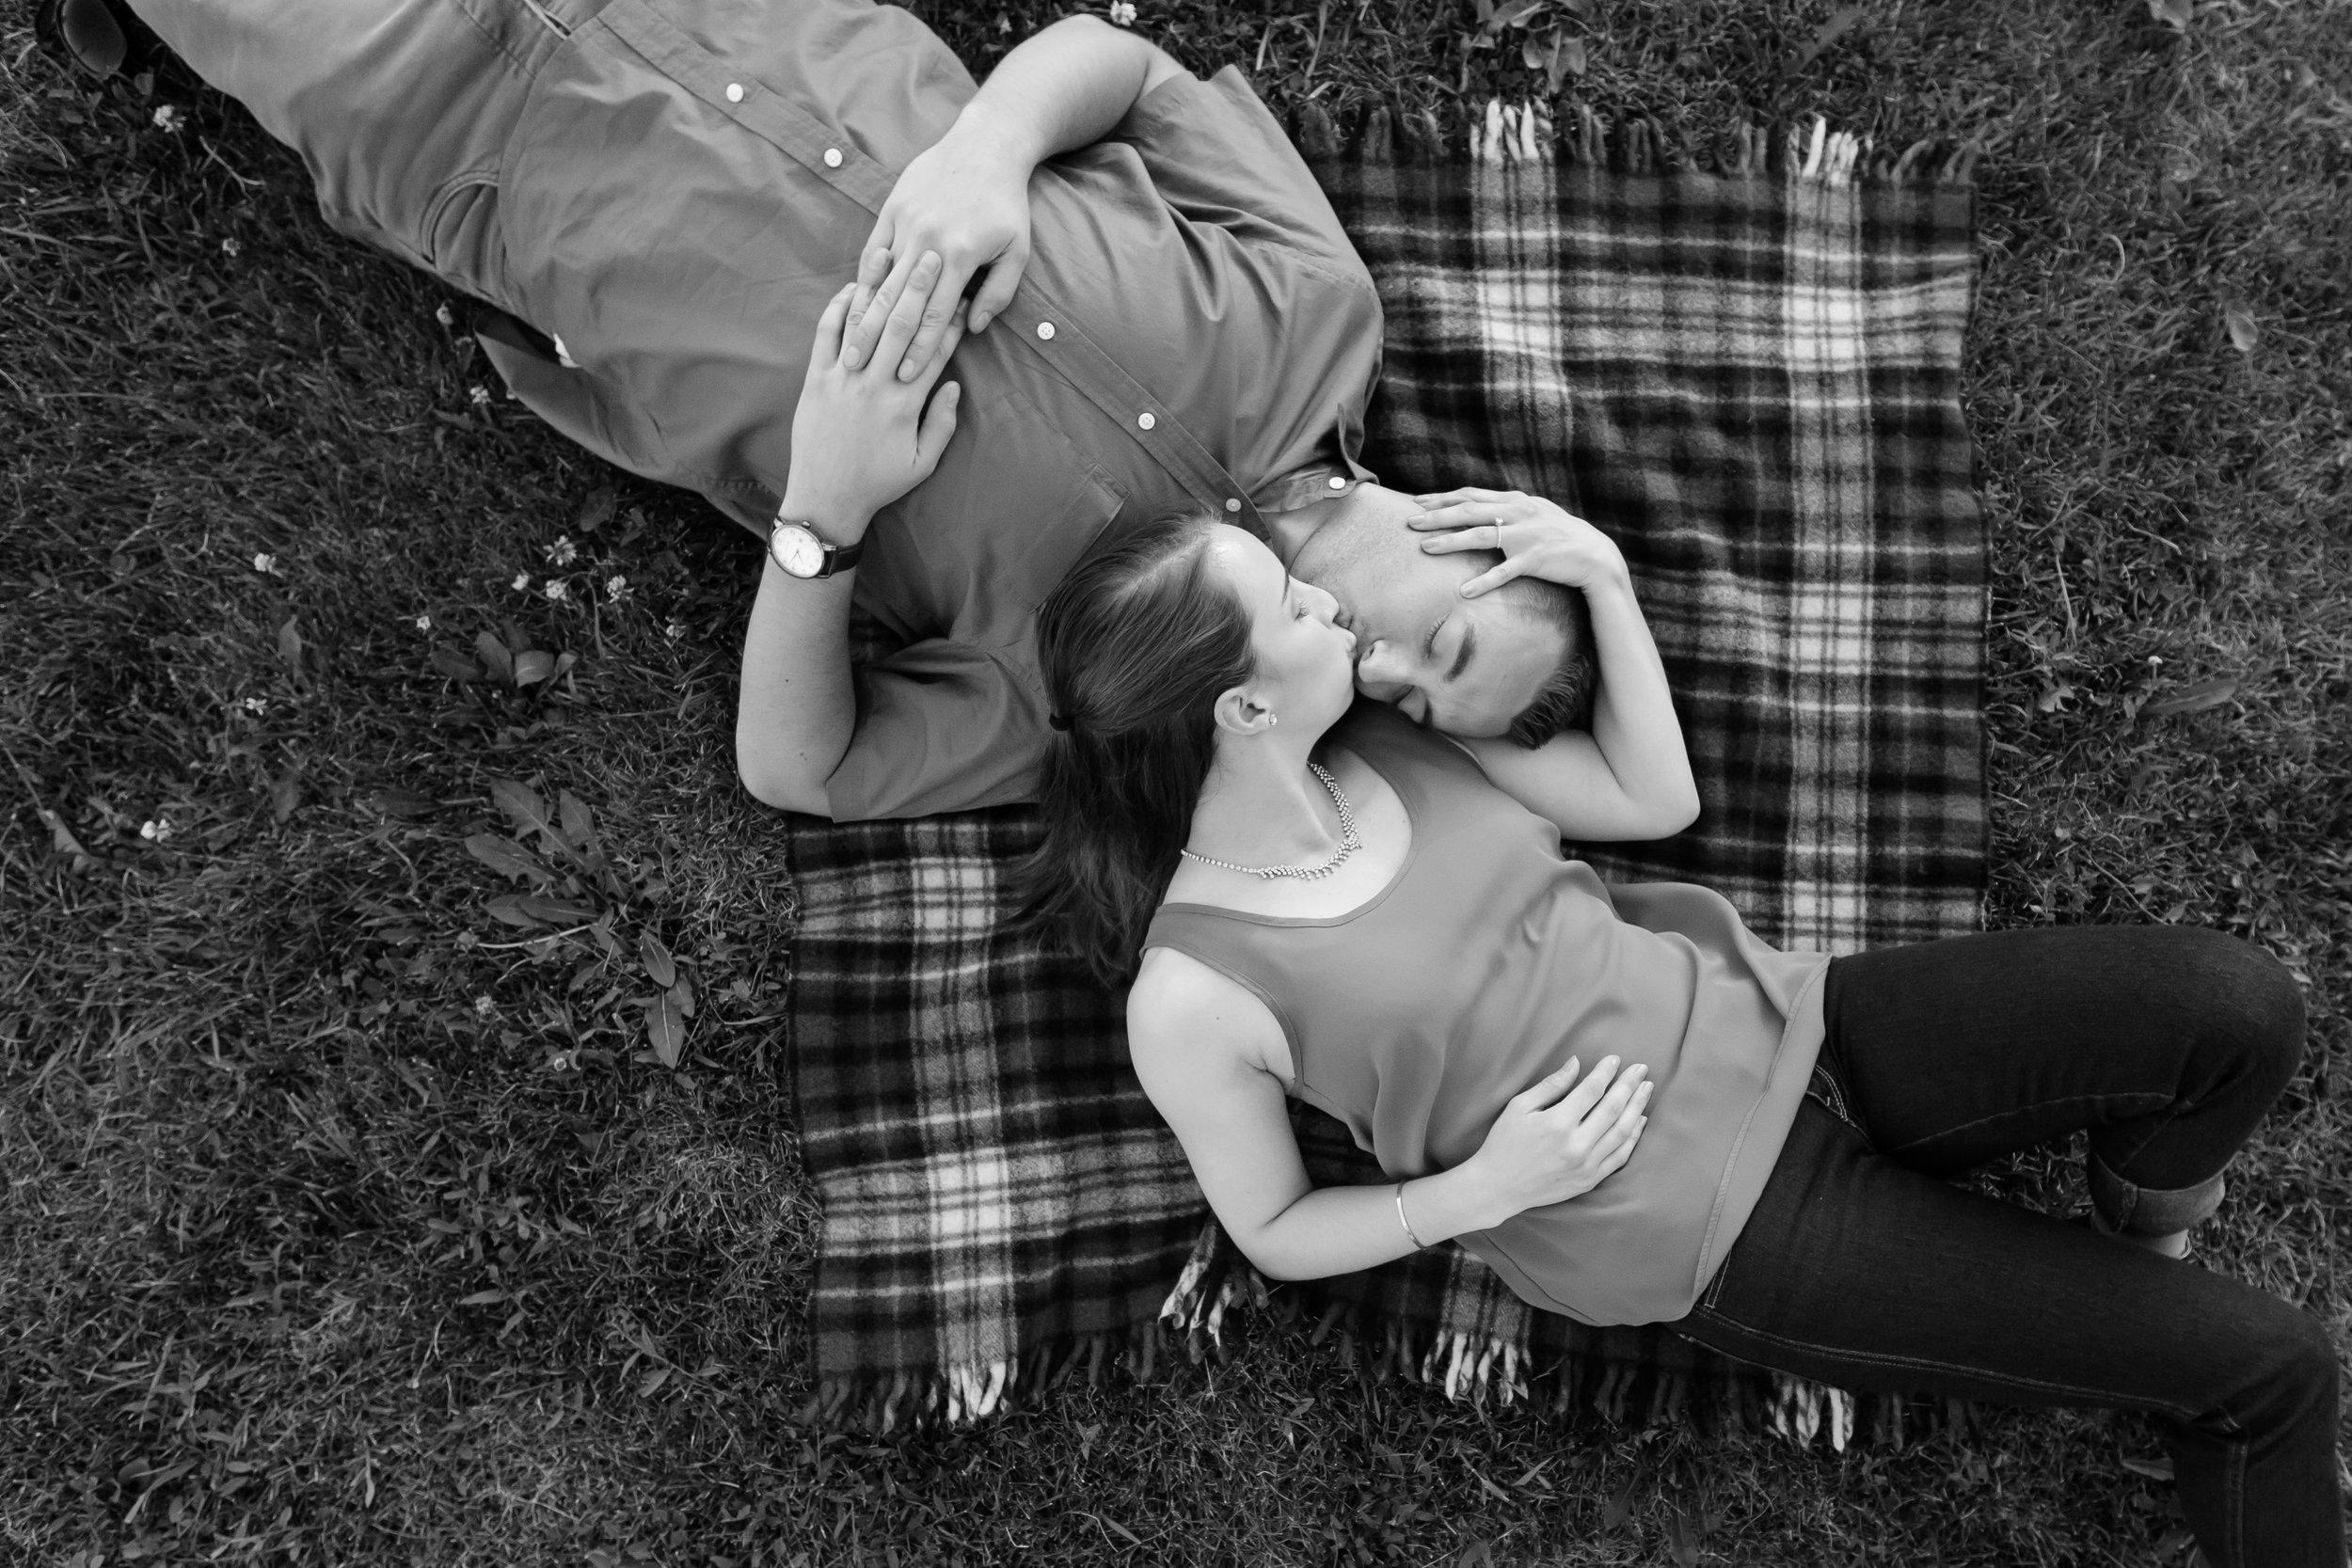 picnic-engagement-photo